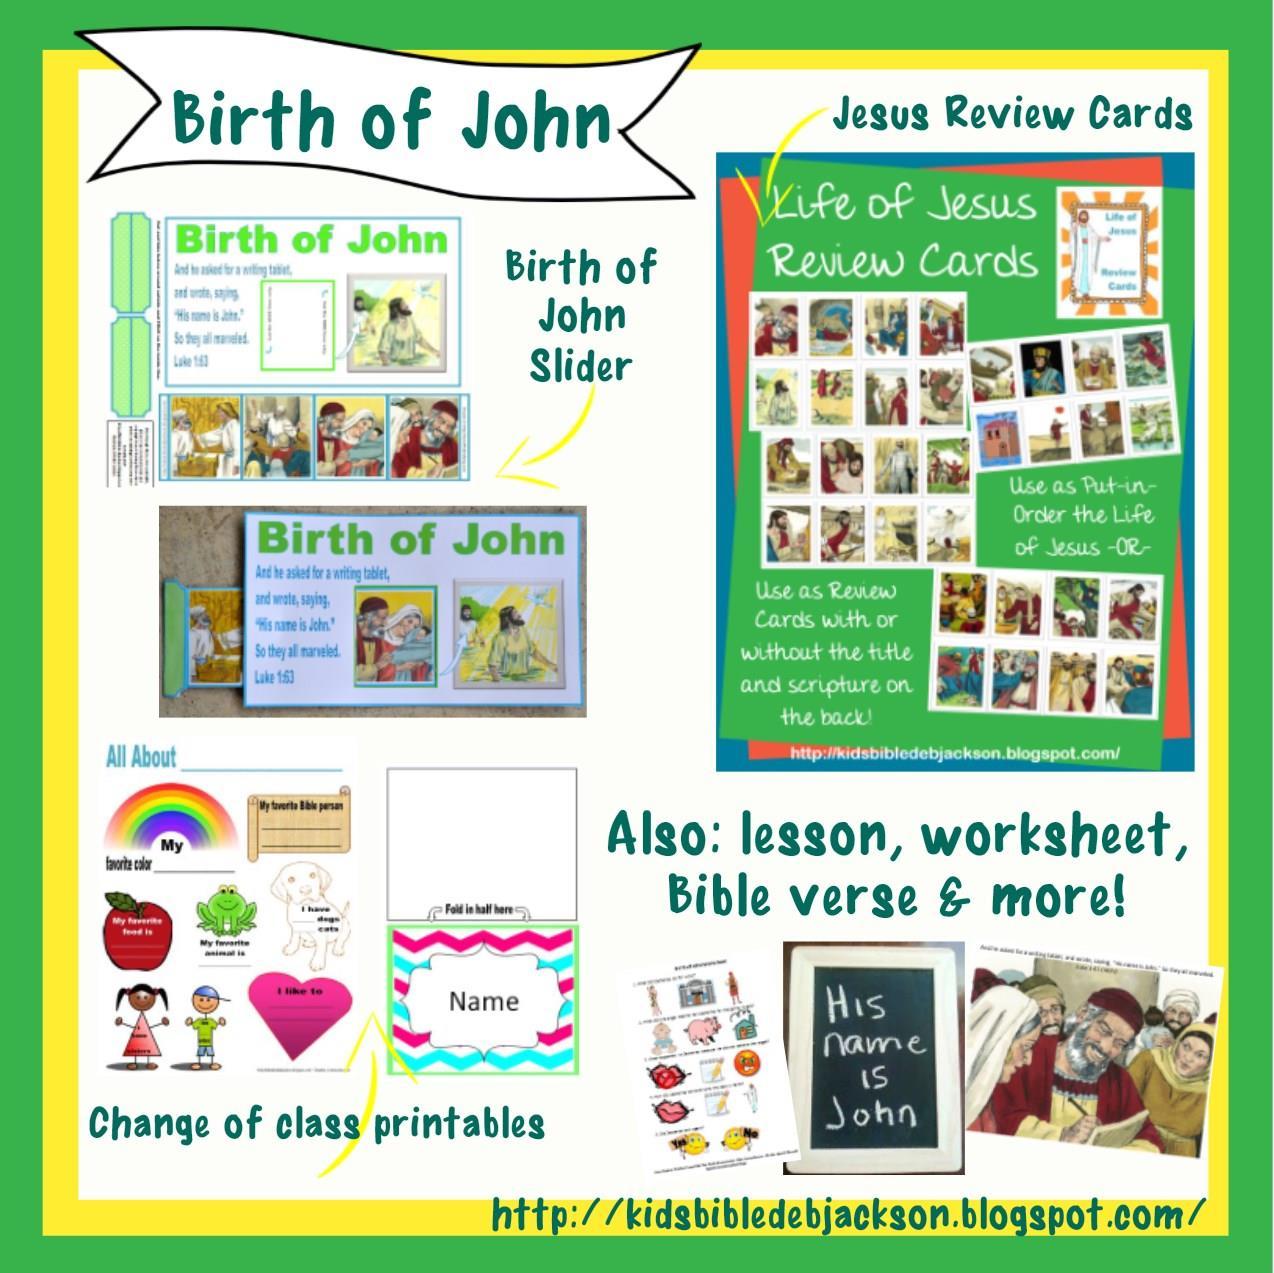 http://kidsbibledebjackson.blogspot.com/2014/05/birth-of-john-baptist.html